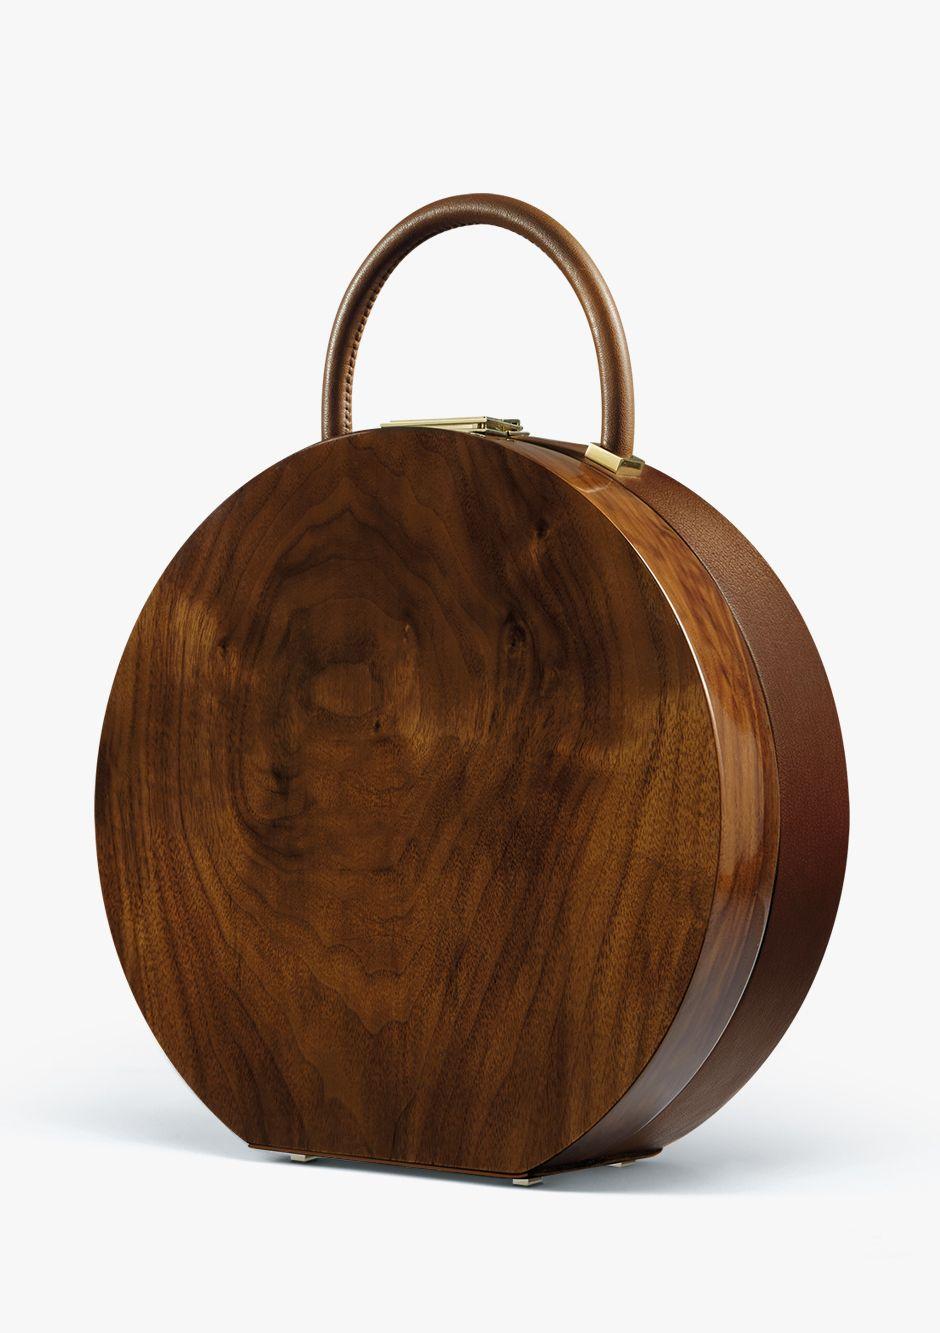 7ed34ca16 michaelkors on in 2019 | Accesories | Bags, Wooden bag, Bag accessories